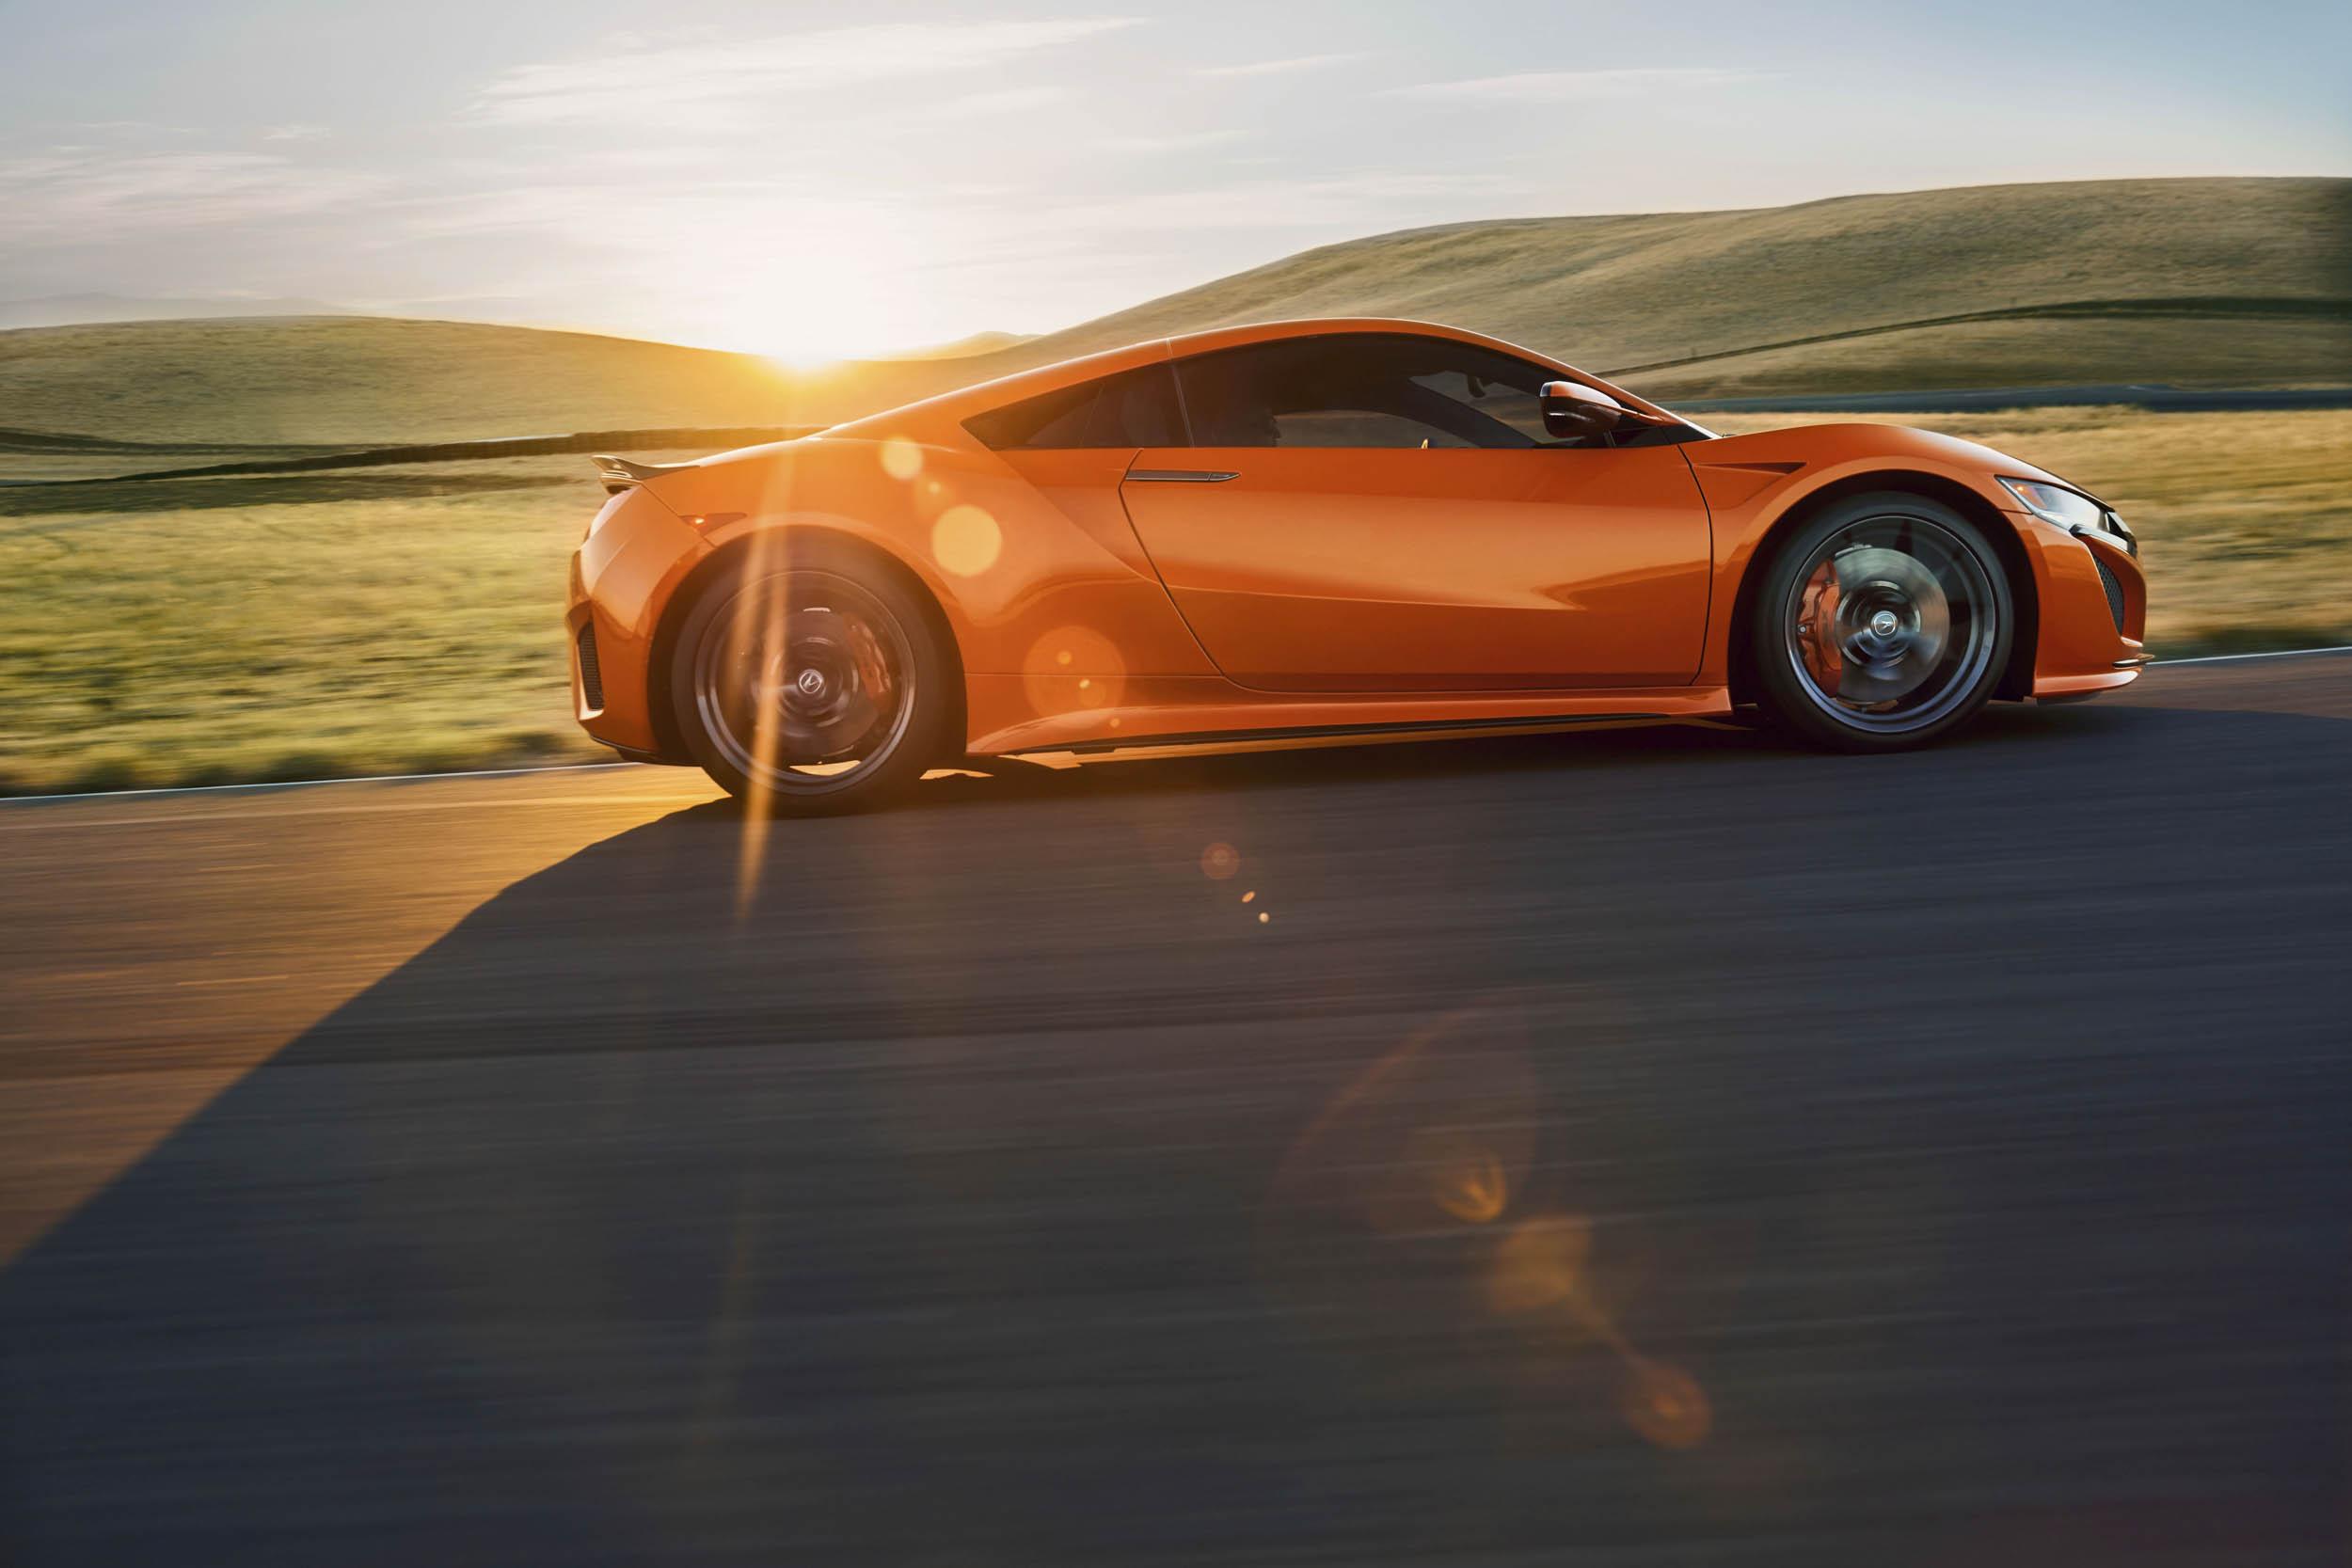 2019 Acura NSX profile